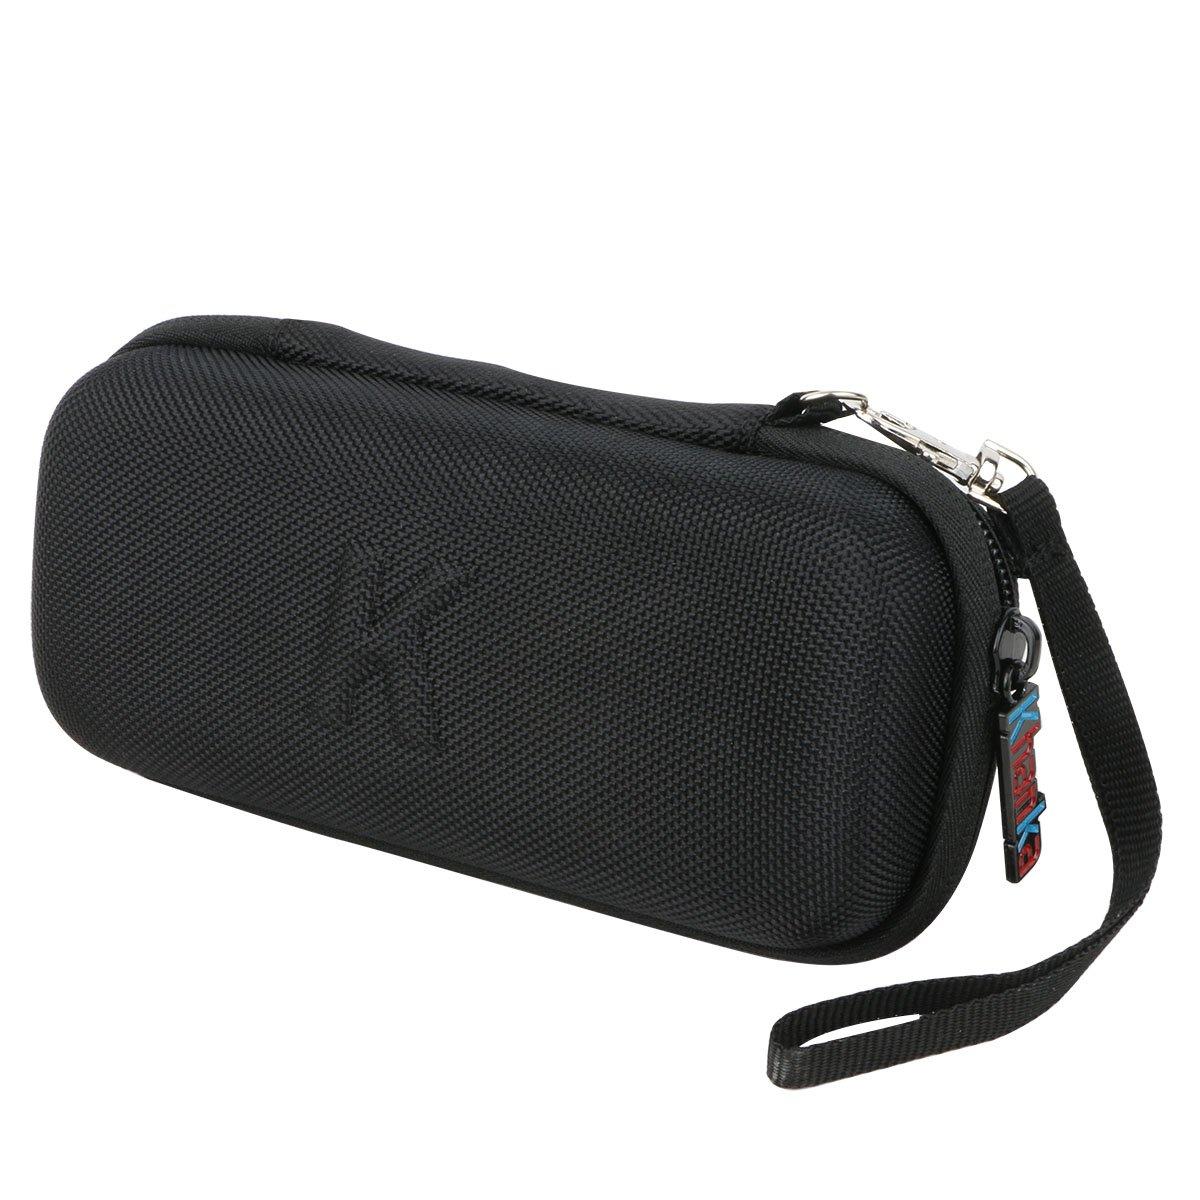 Khanka Hard Travel Case Replacement for Qardio Arm Wireless Blood Pressure Monitor A100